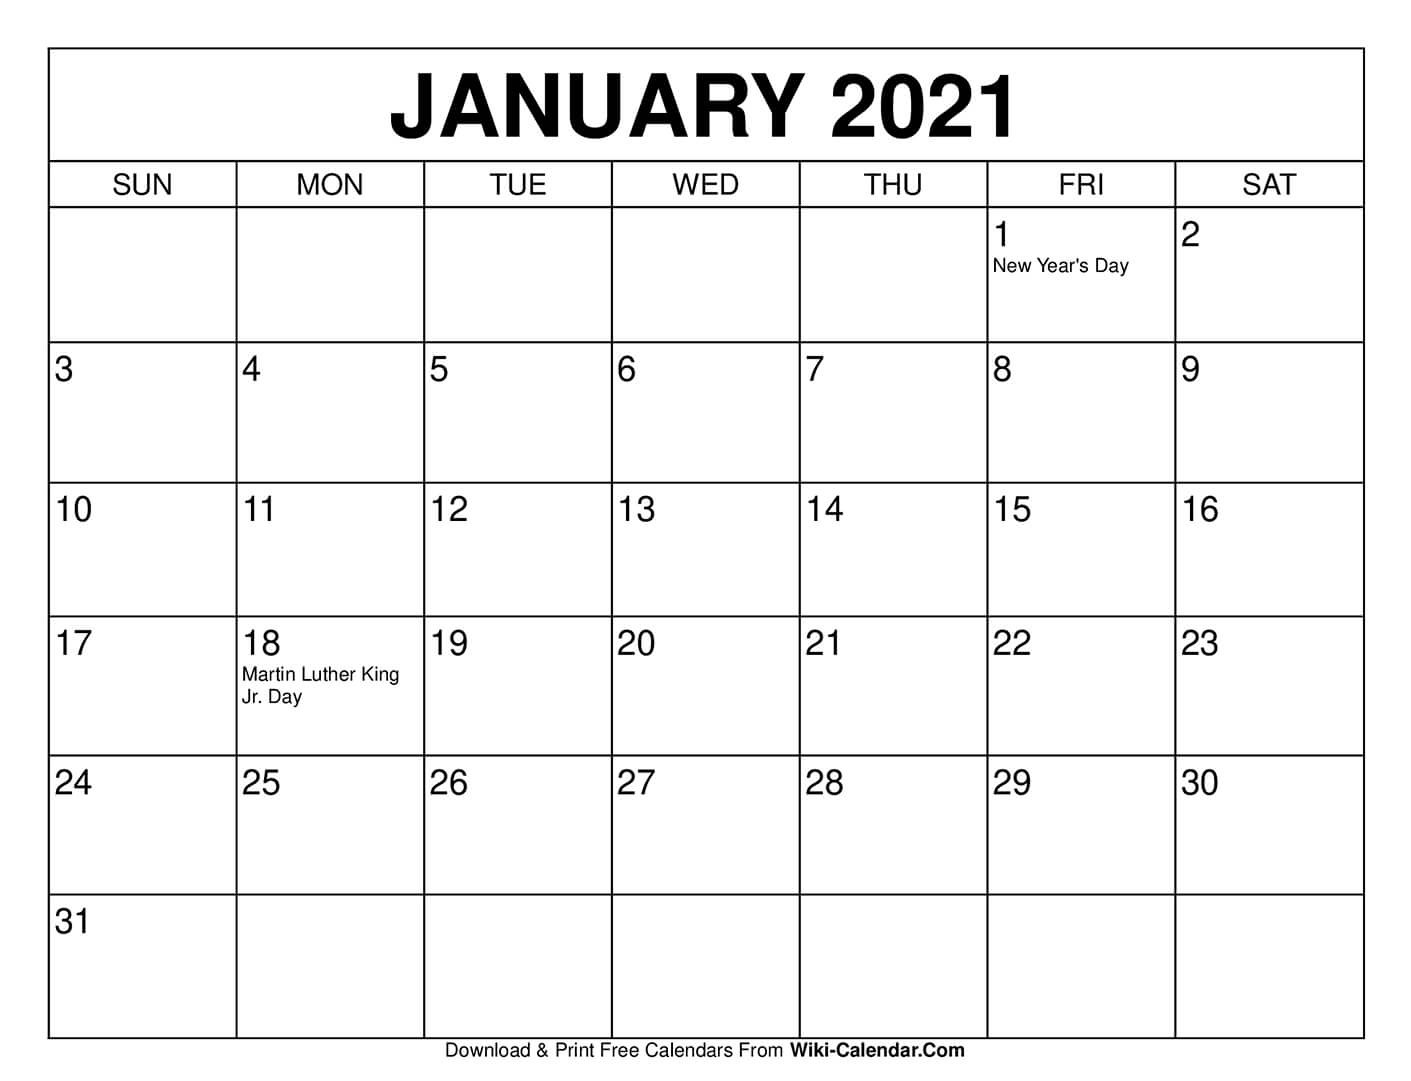 Free Printable January 2021 Calendars-Printable Calendar 2021